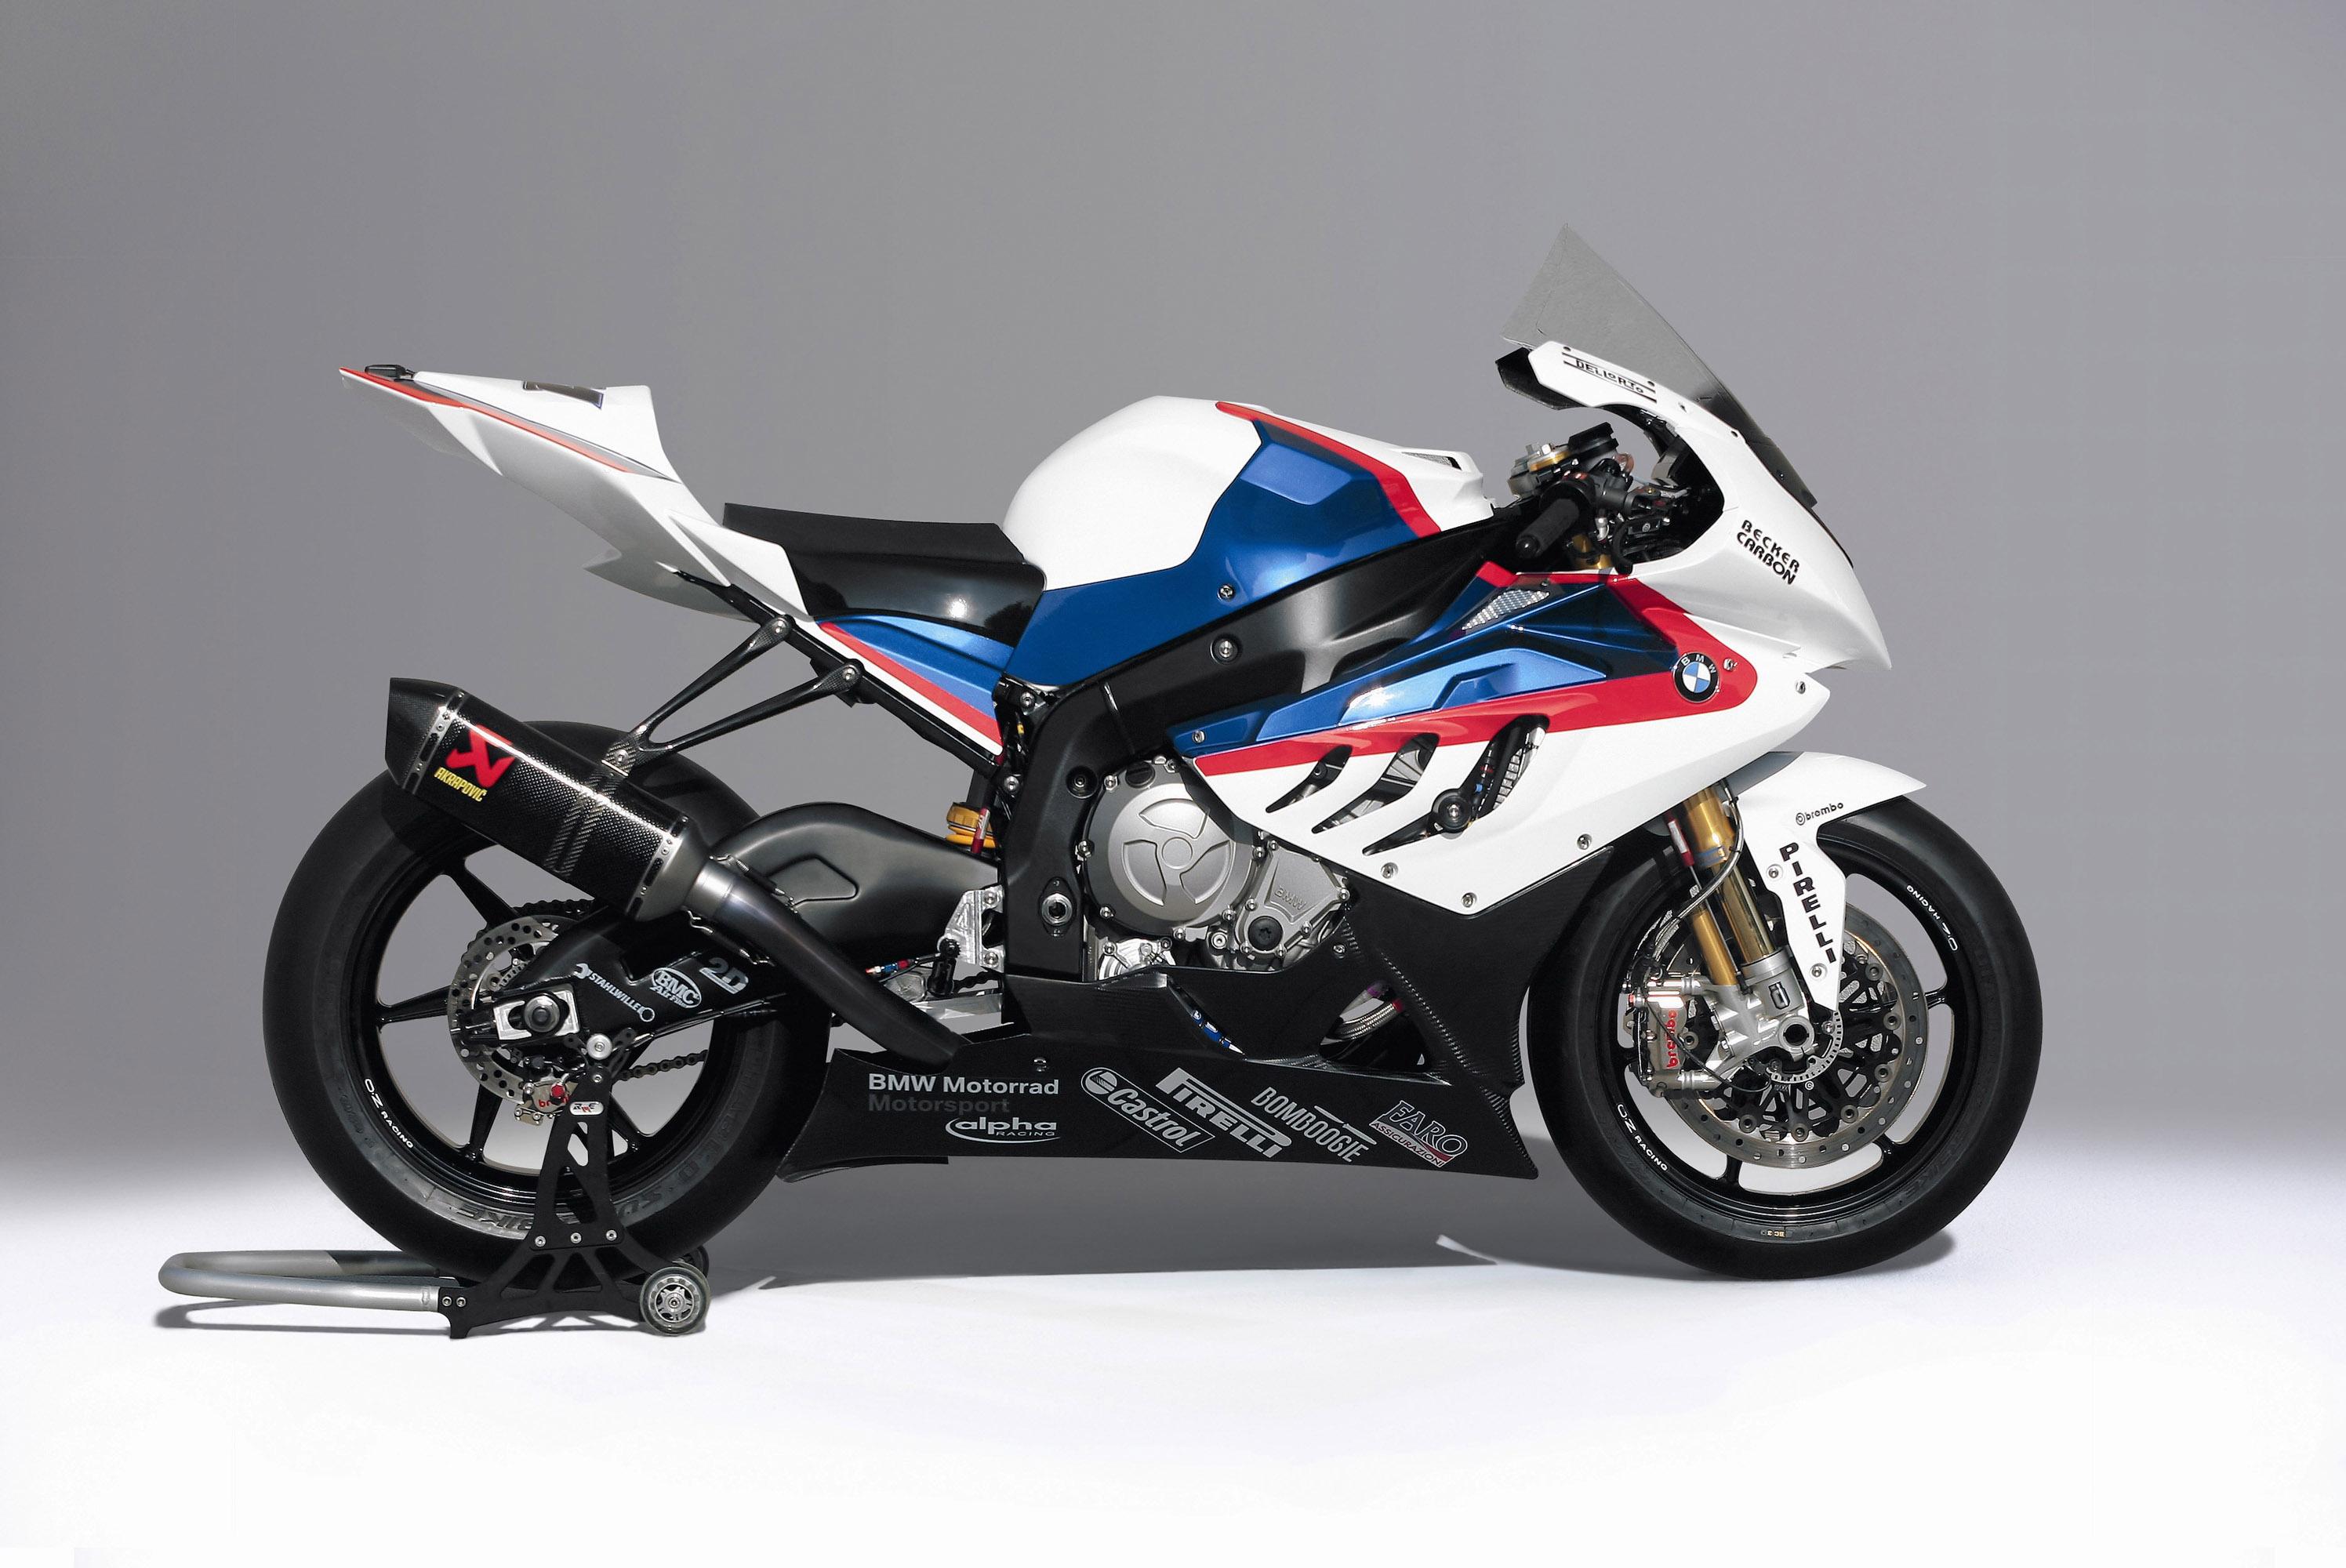 Bmw S 1000 Rr Sbk Racebike Picture 13059